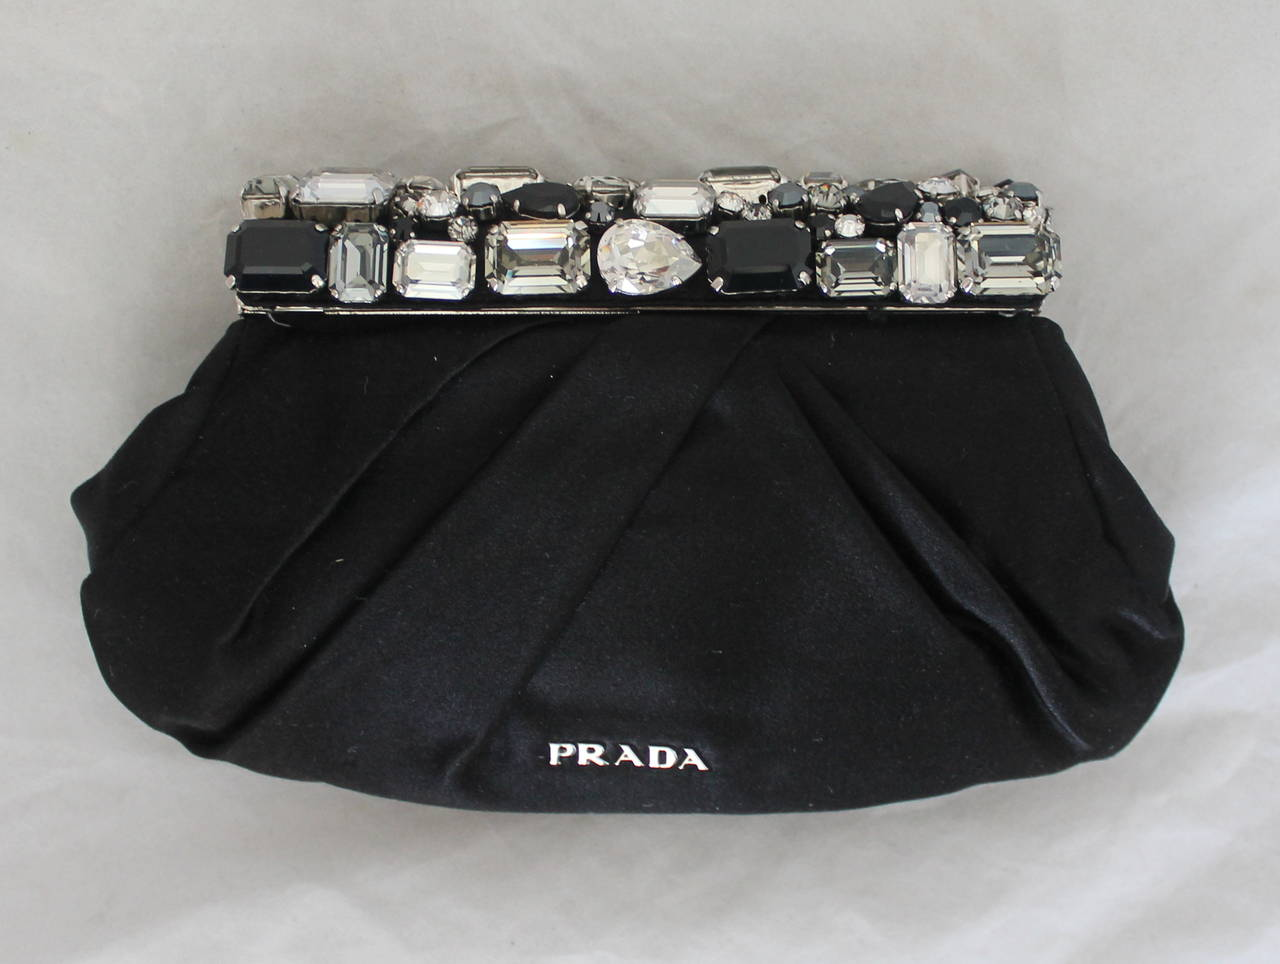 black prada handbags - Prada Black Satin Clutch with Rhinestone Cluster Handle SHW rt ...